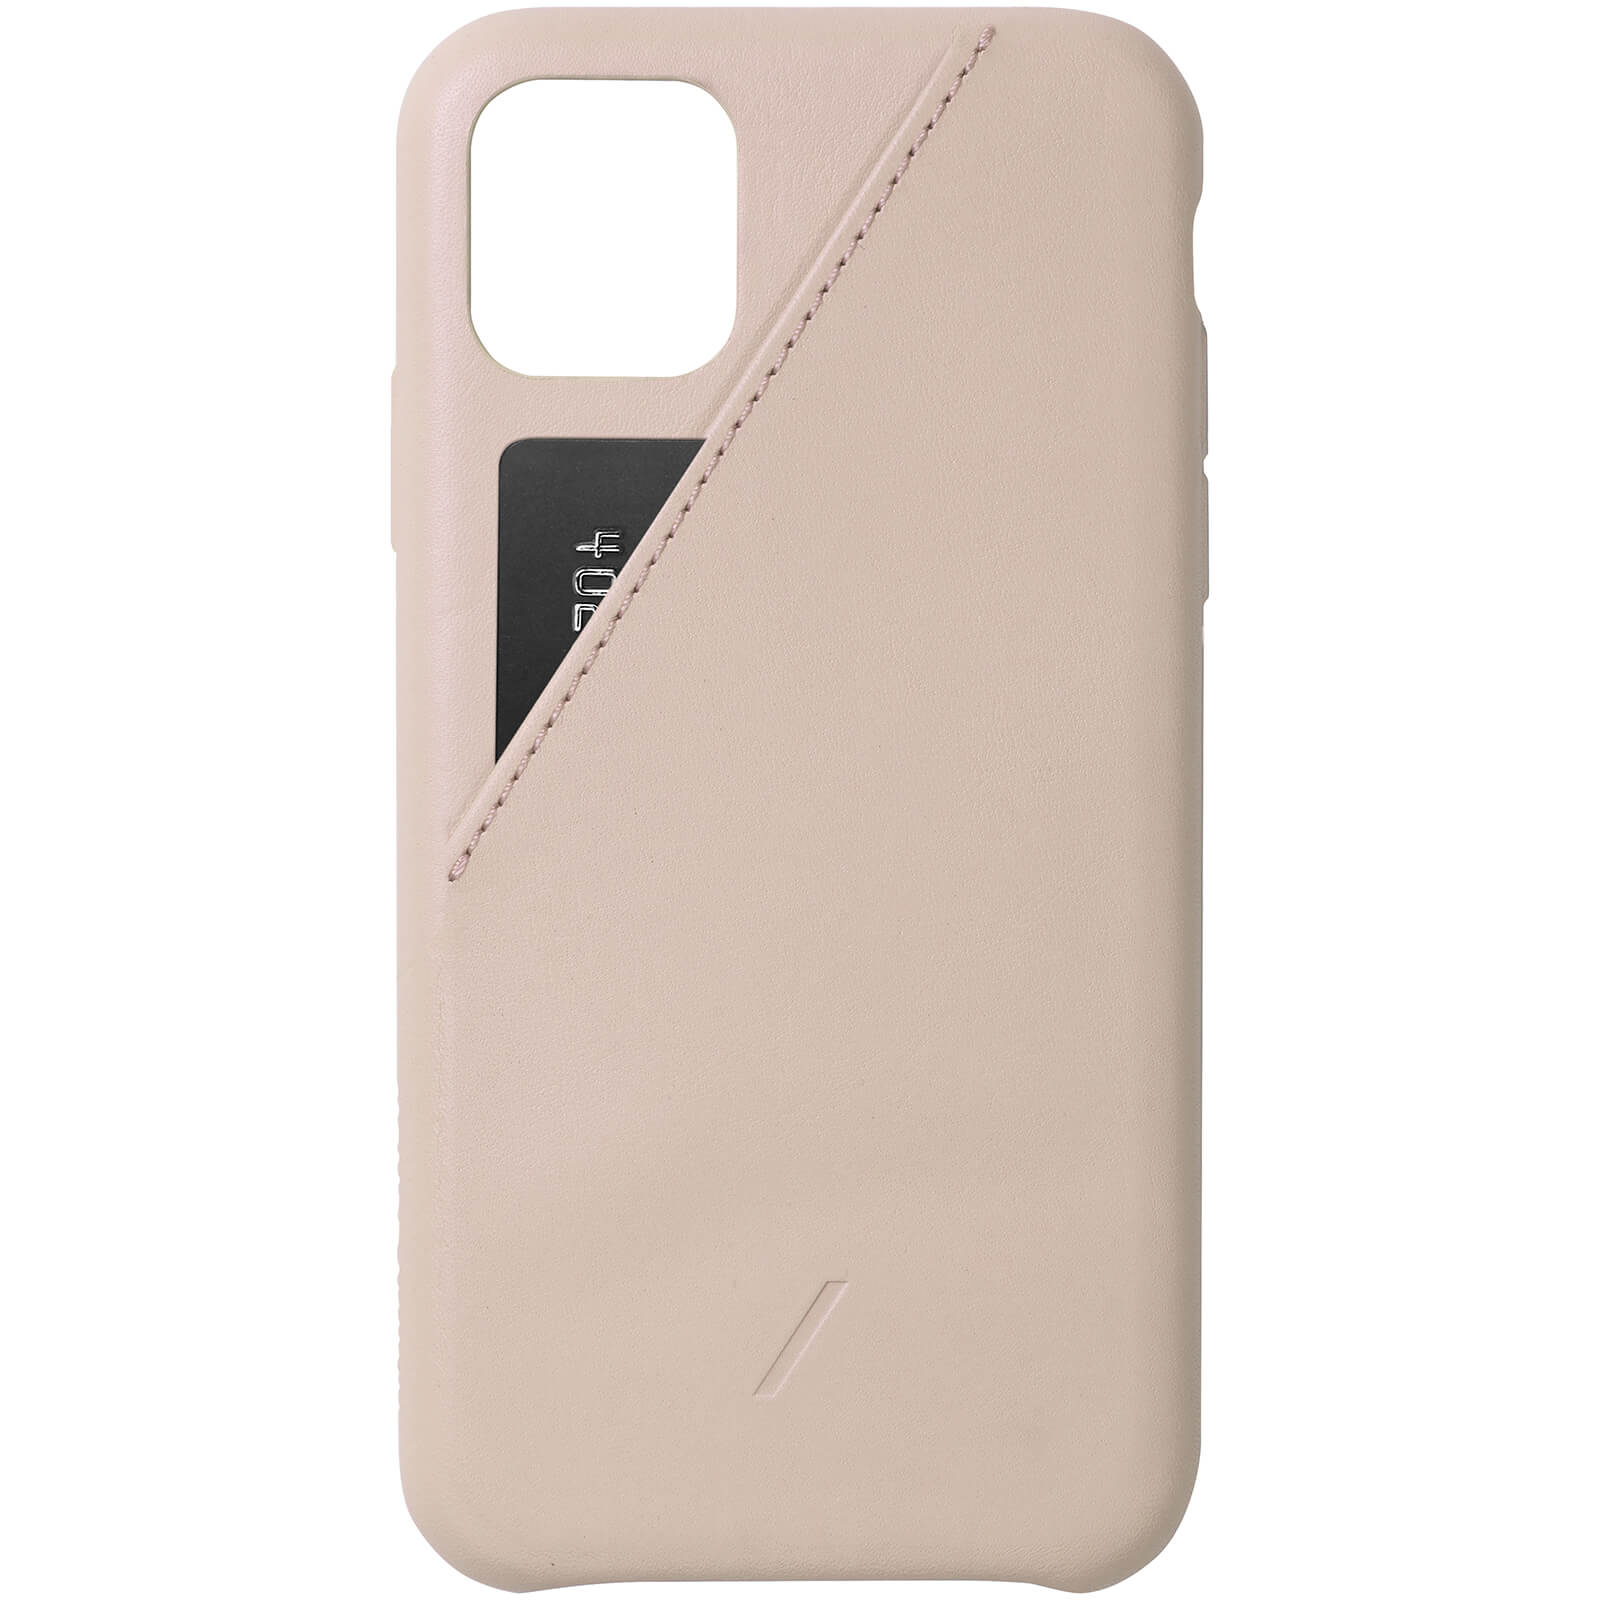 Native Union Clic Card iPhone Case - Nude - iPhone 11 Pro Max